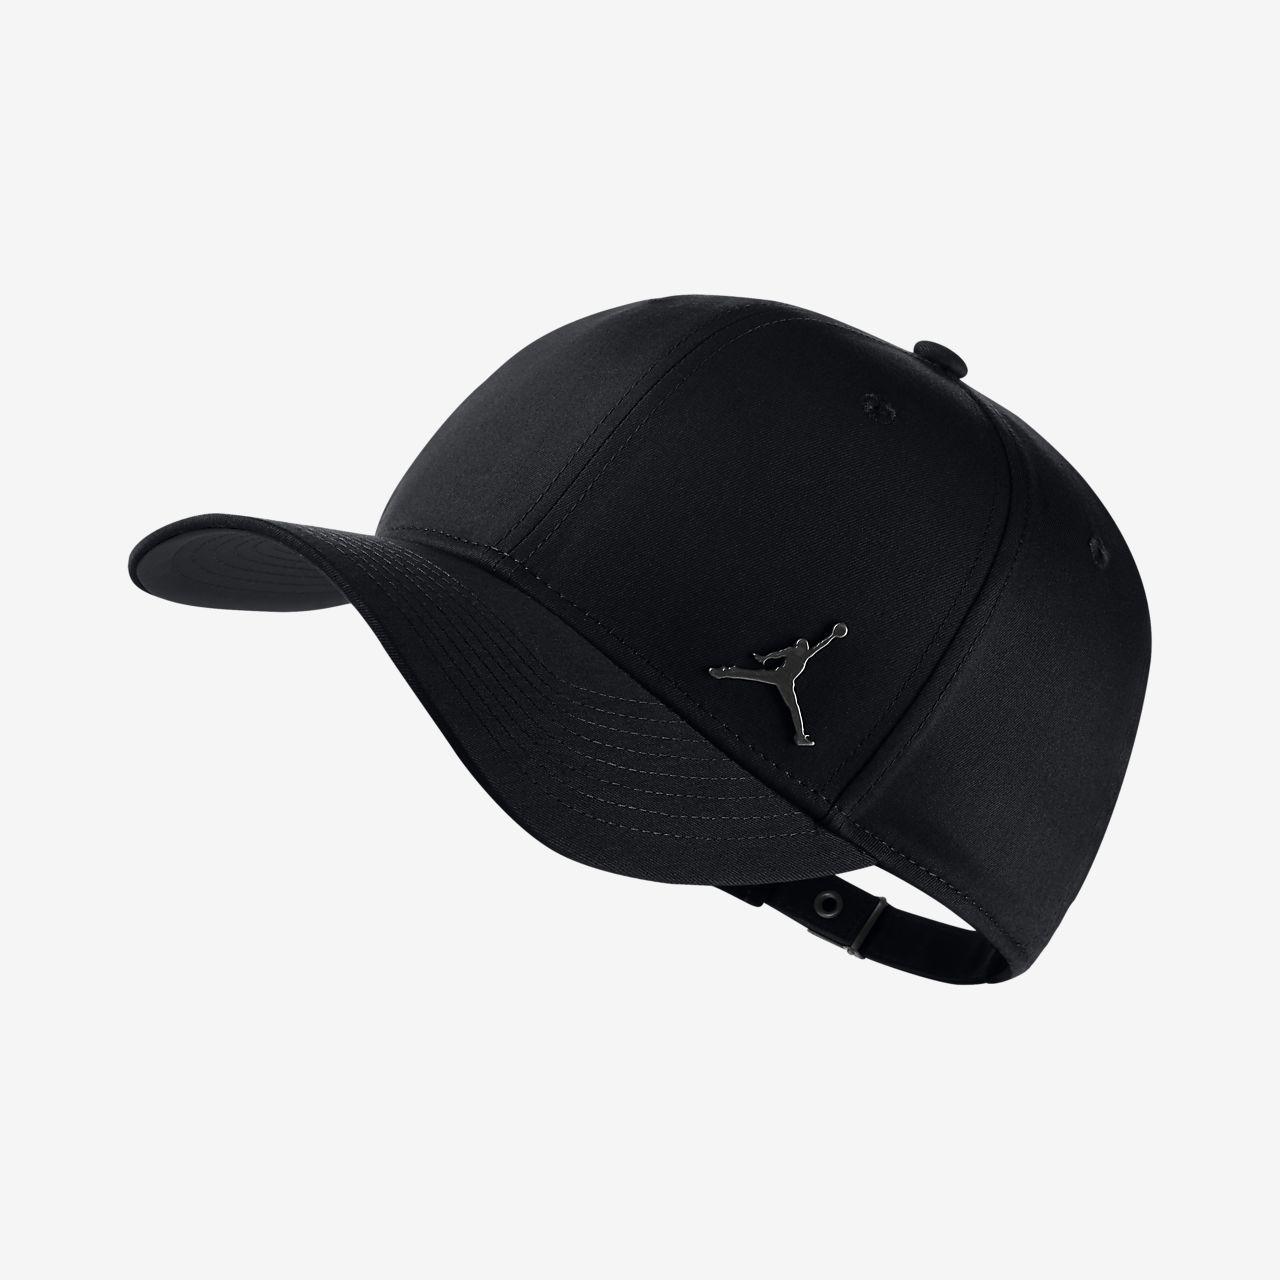 d7b4f972497 Jordan Classic99 Metal Jumpman Adjustable Hat. Nike.com LU